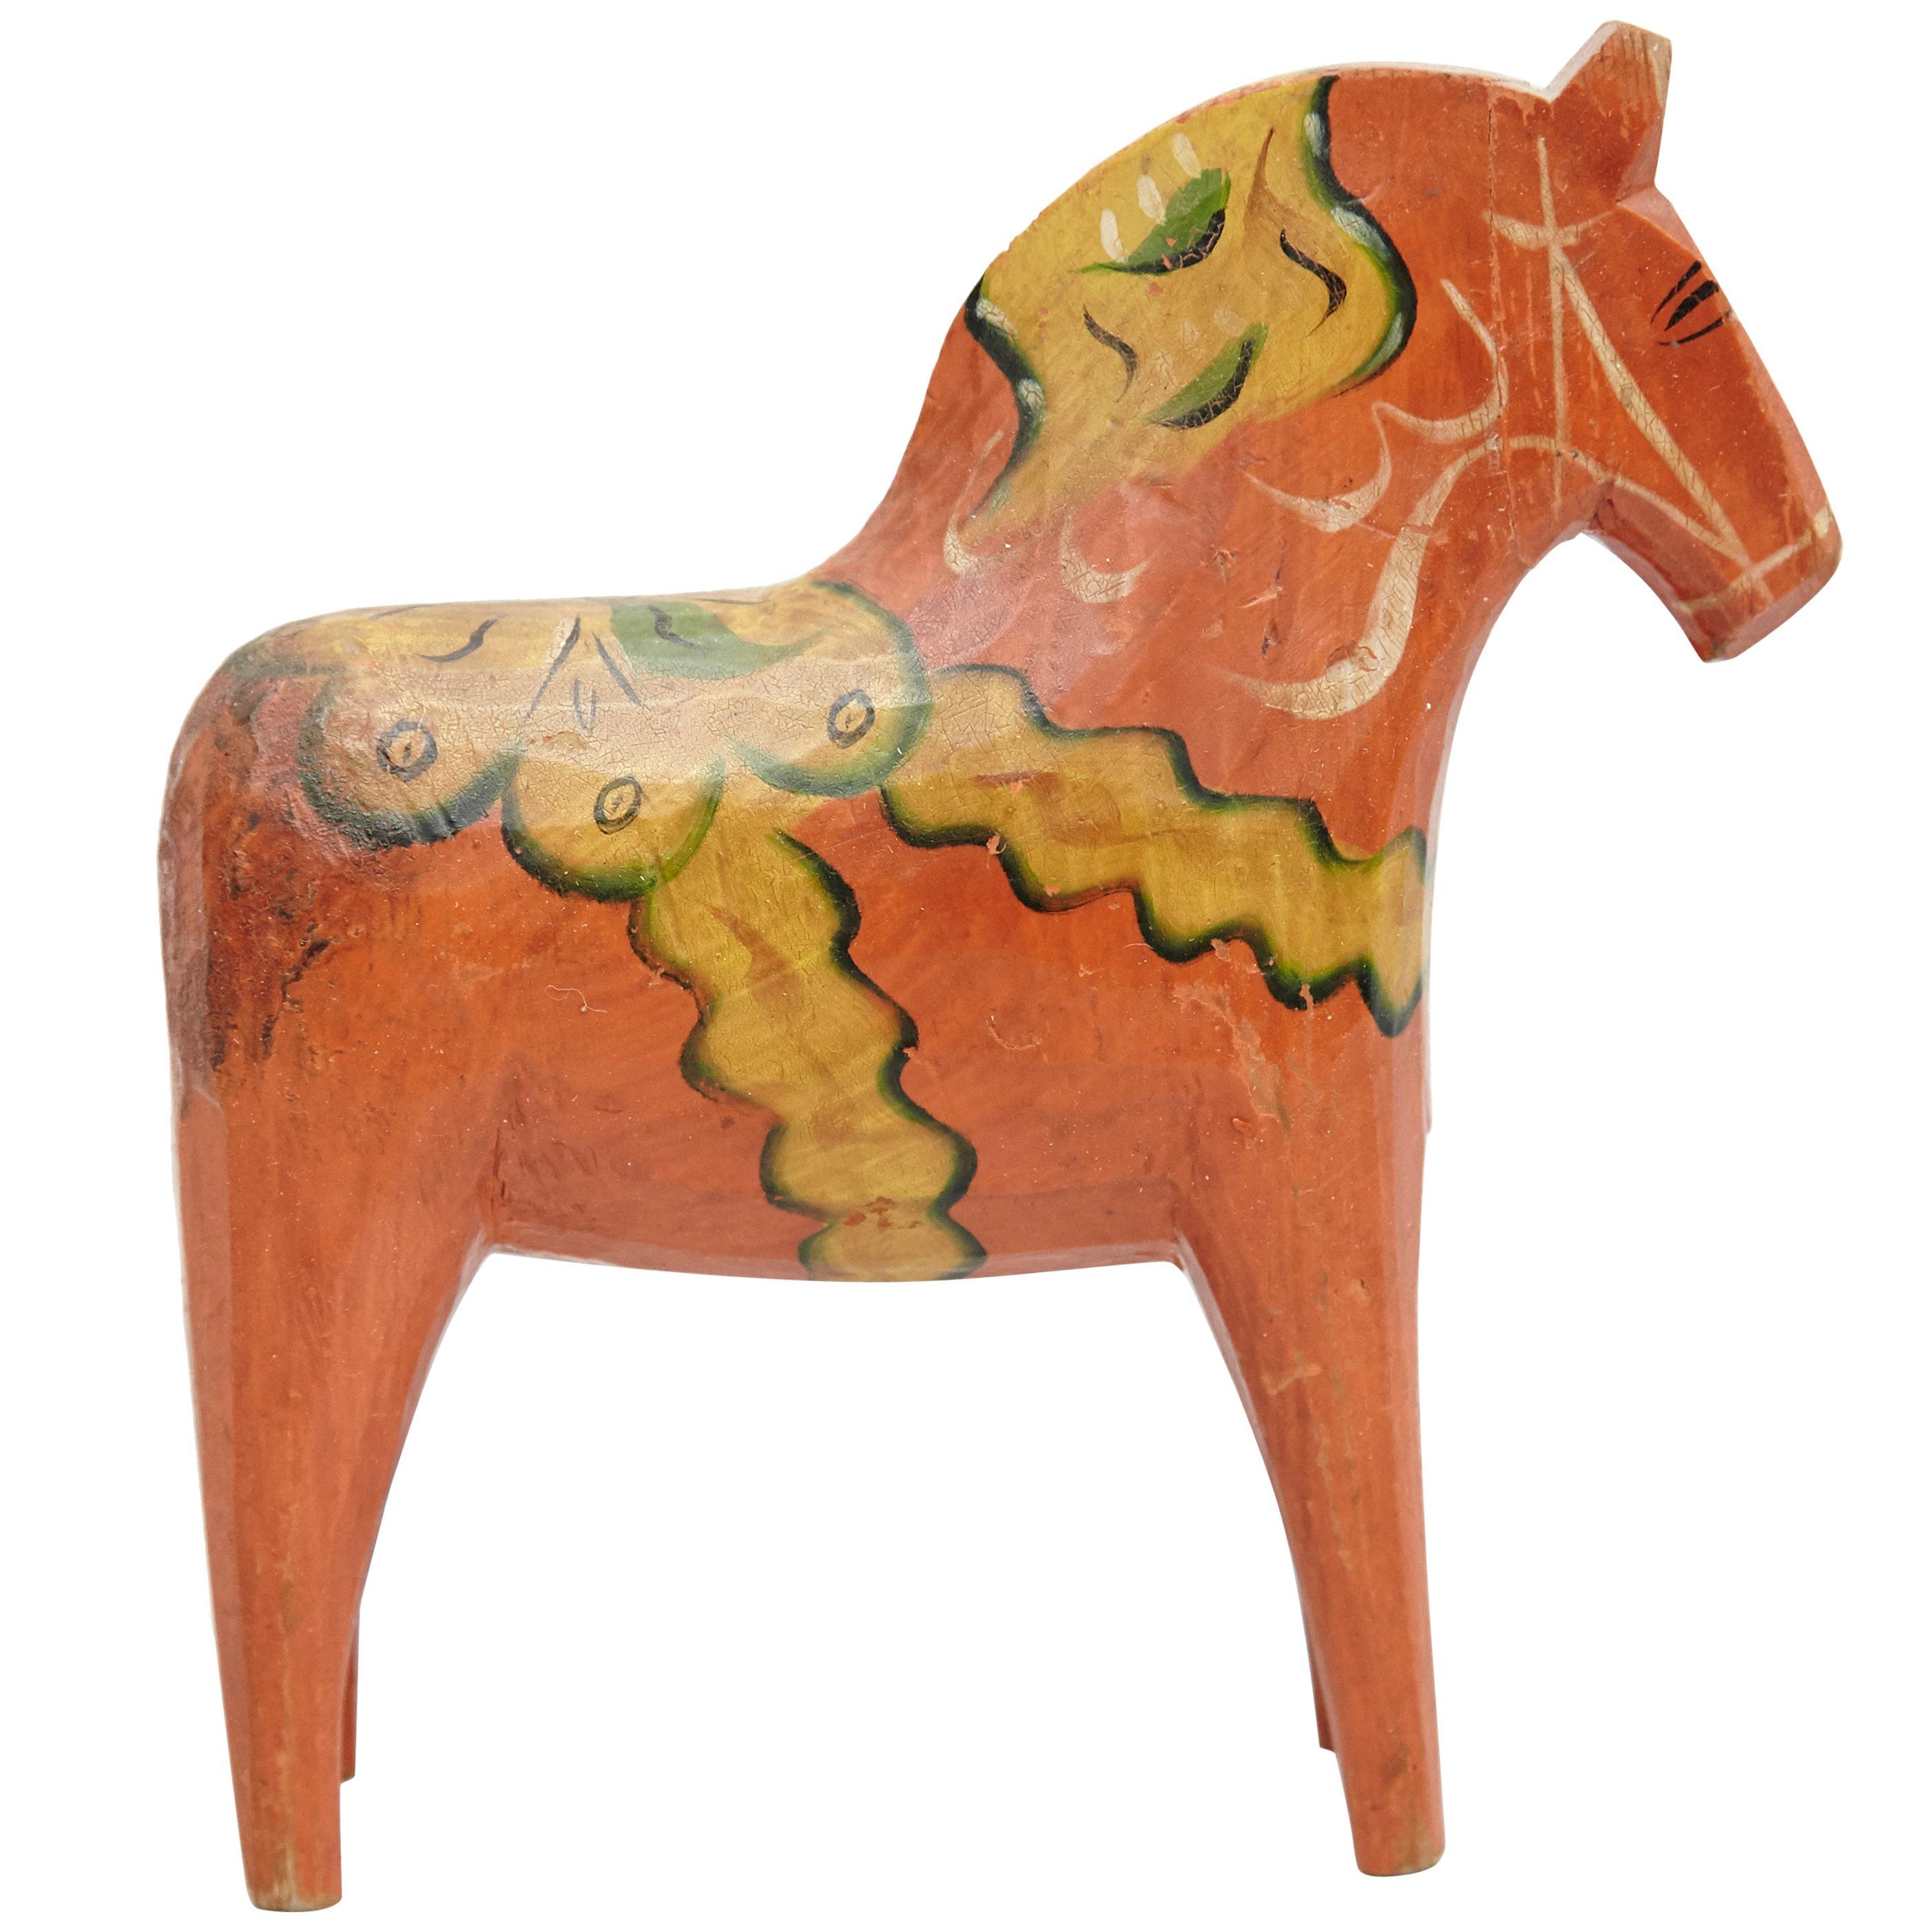 Swedish Folk Wooden Horse Toy, circa 1920